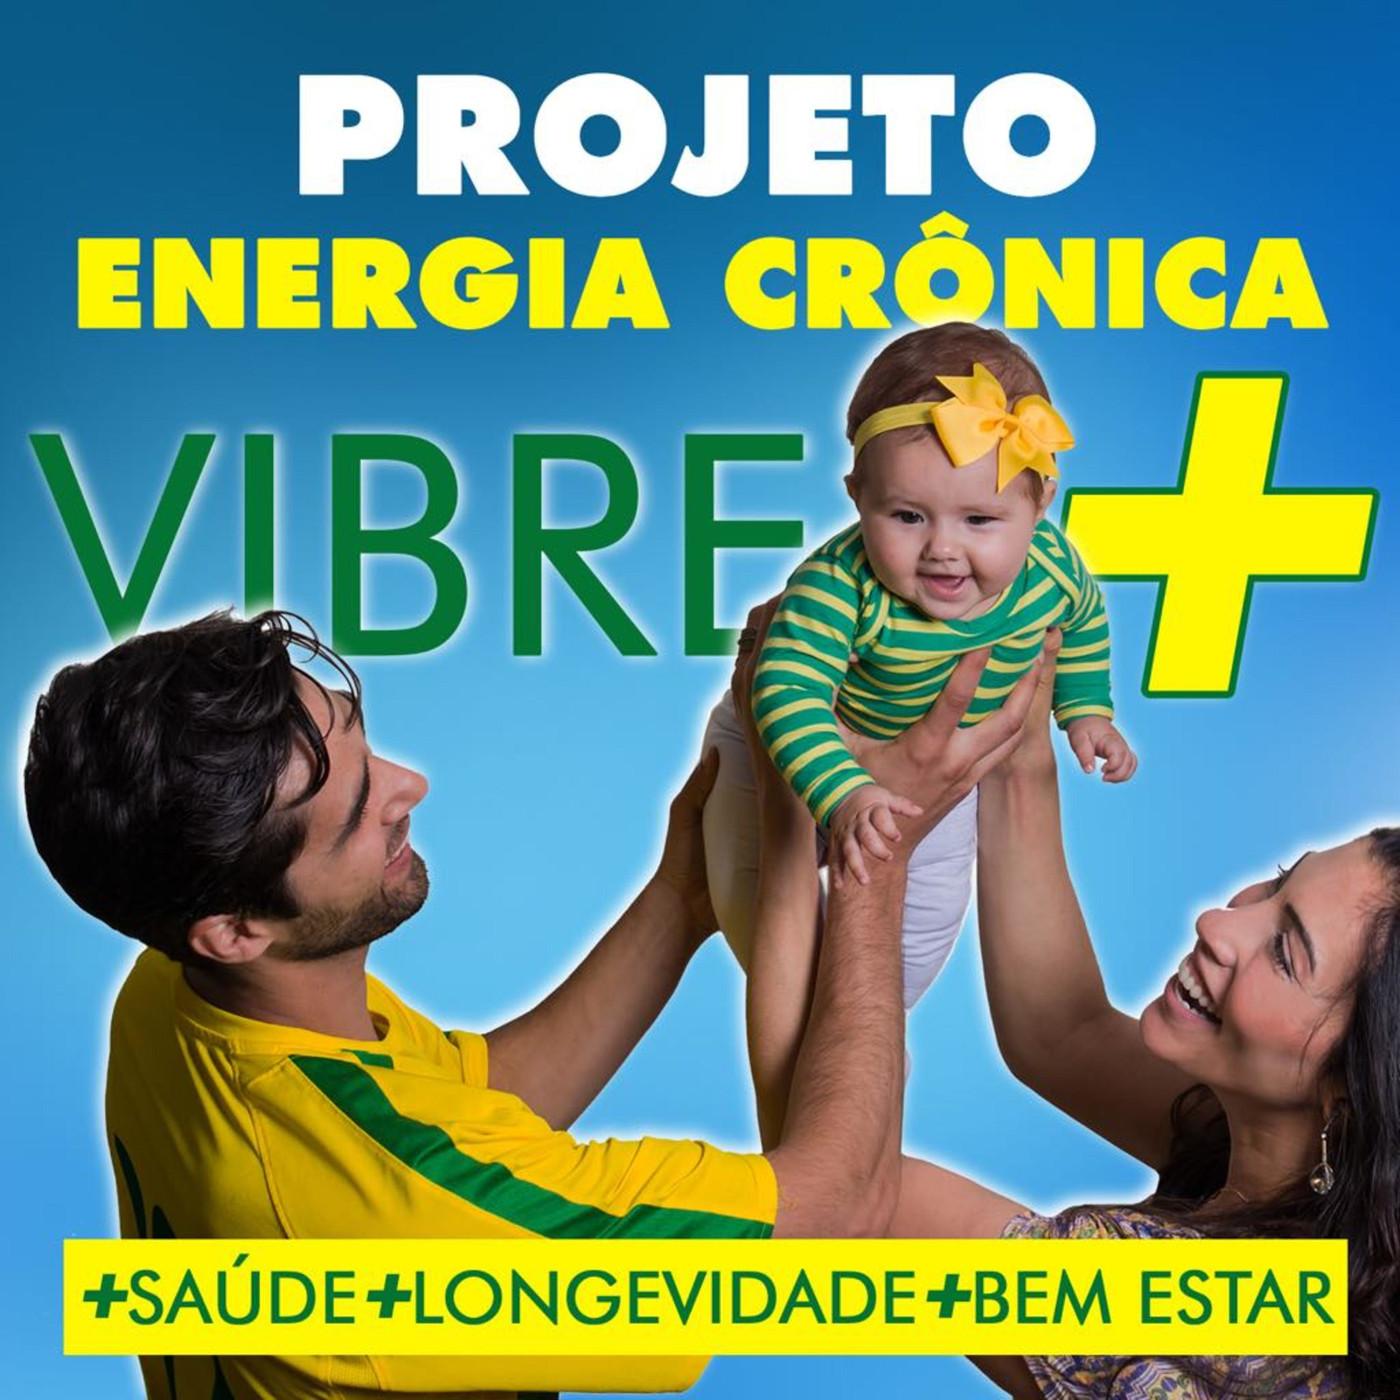 Projeto Energia Crônica: +Saúd